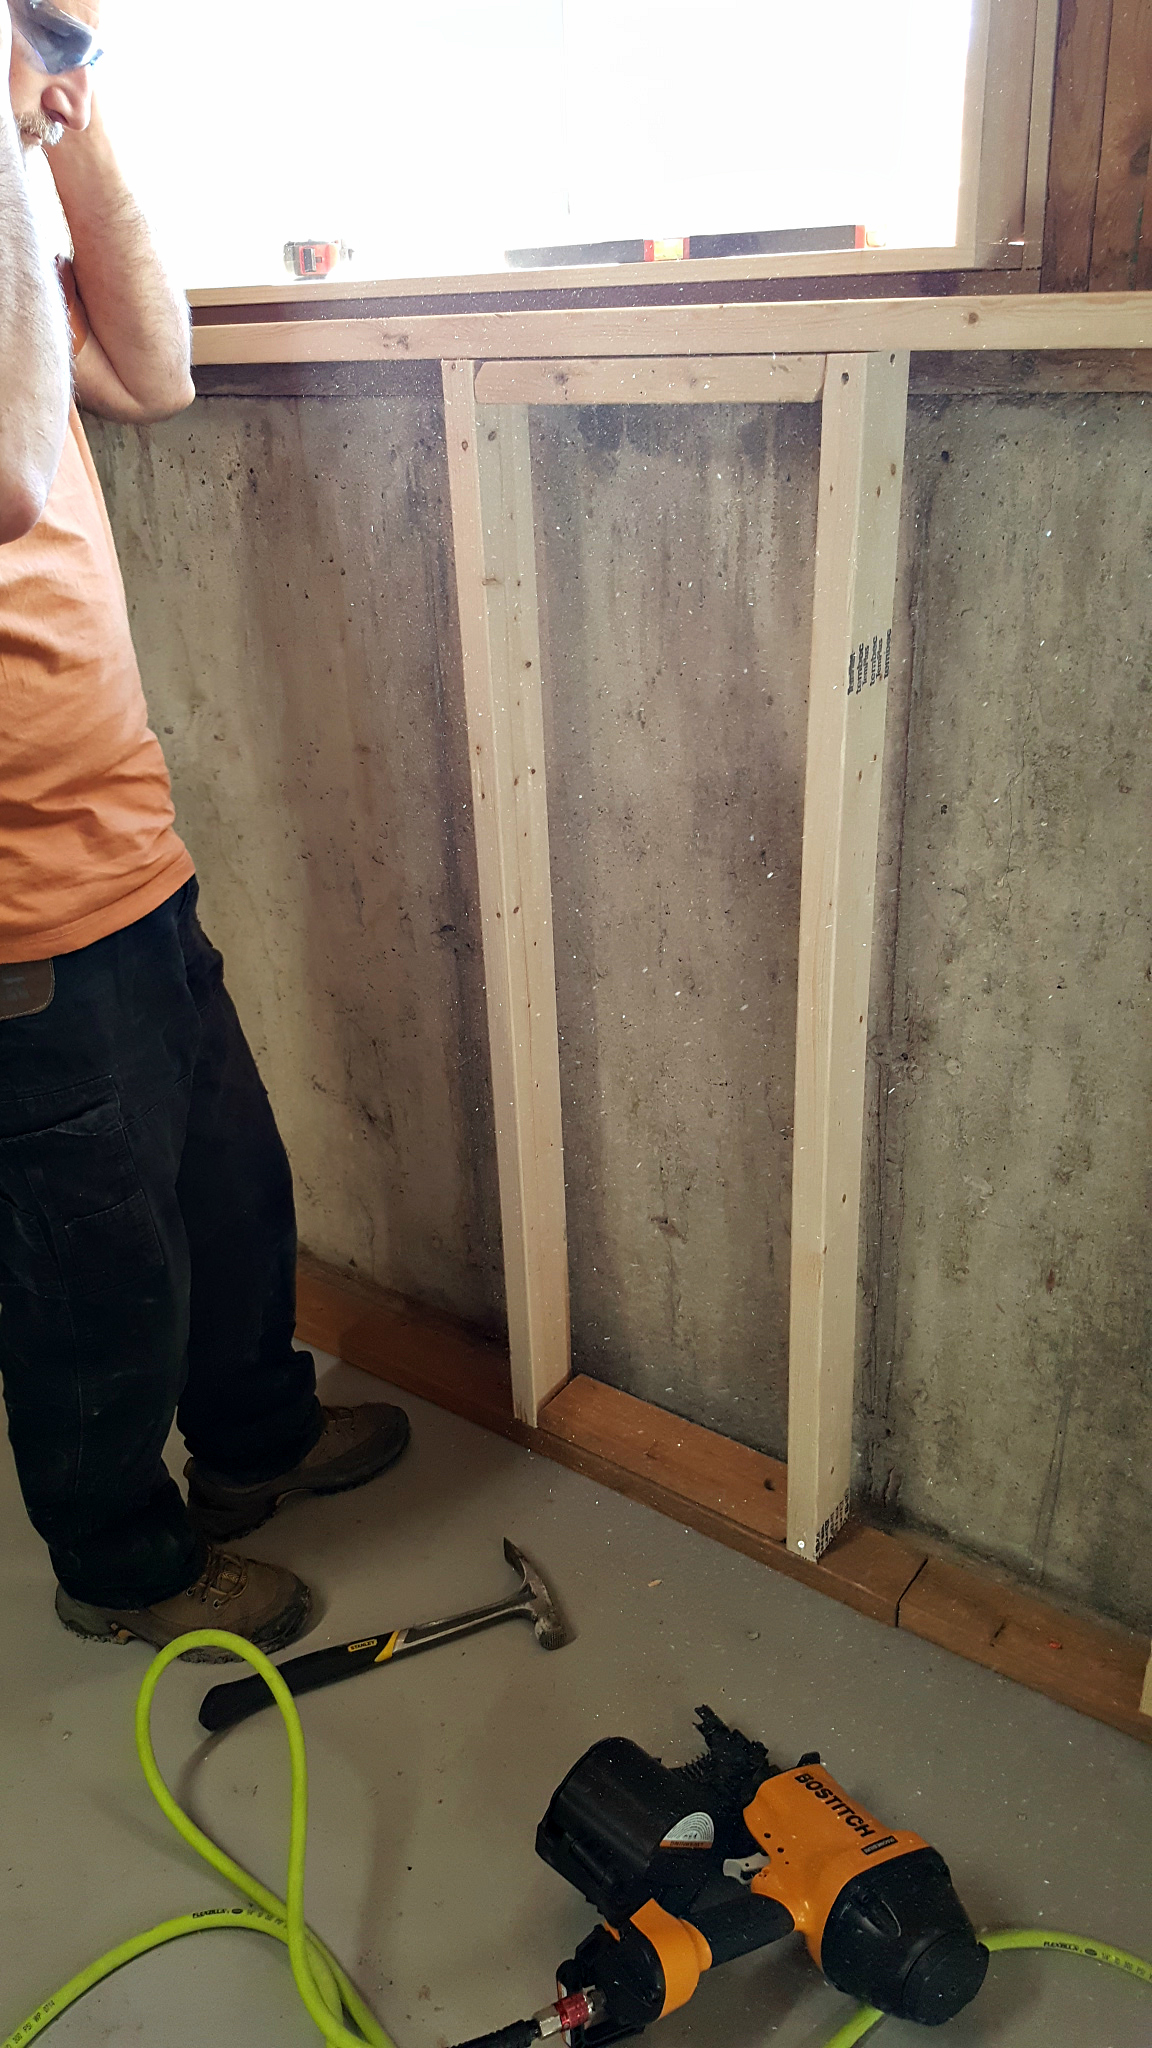 basement framing and spray foam insulation - window framing